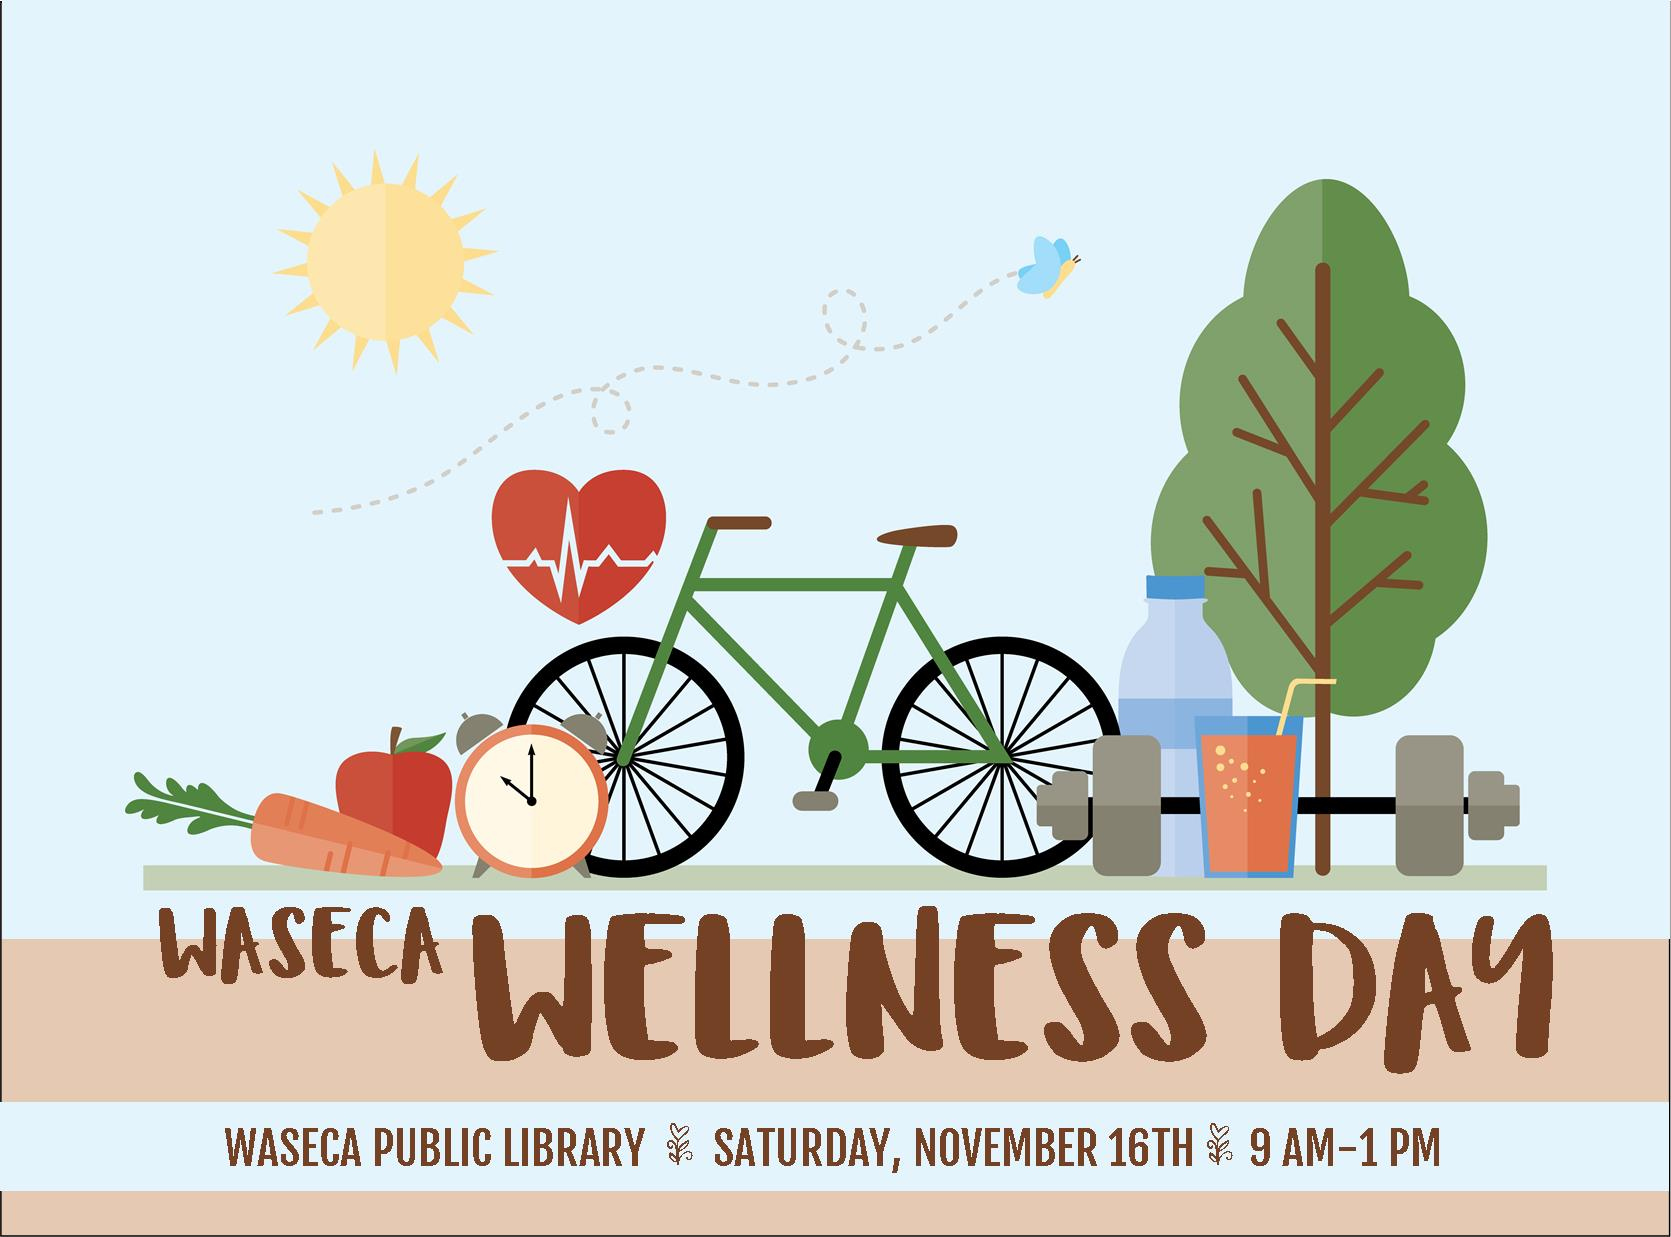 Waseca Wellness Day